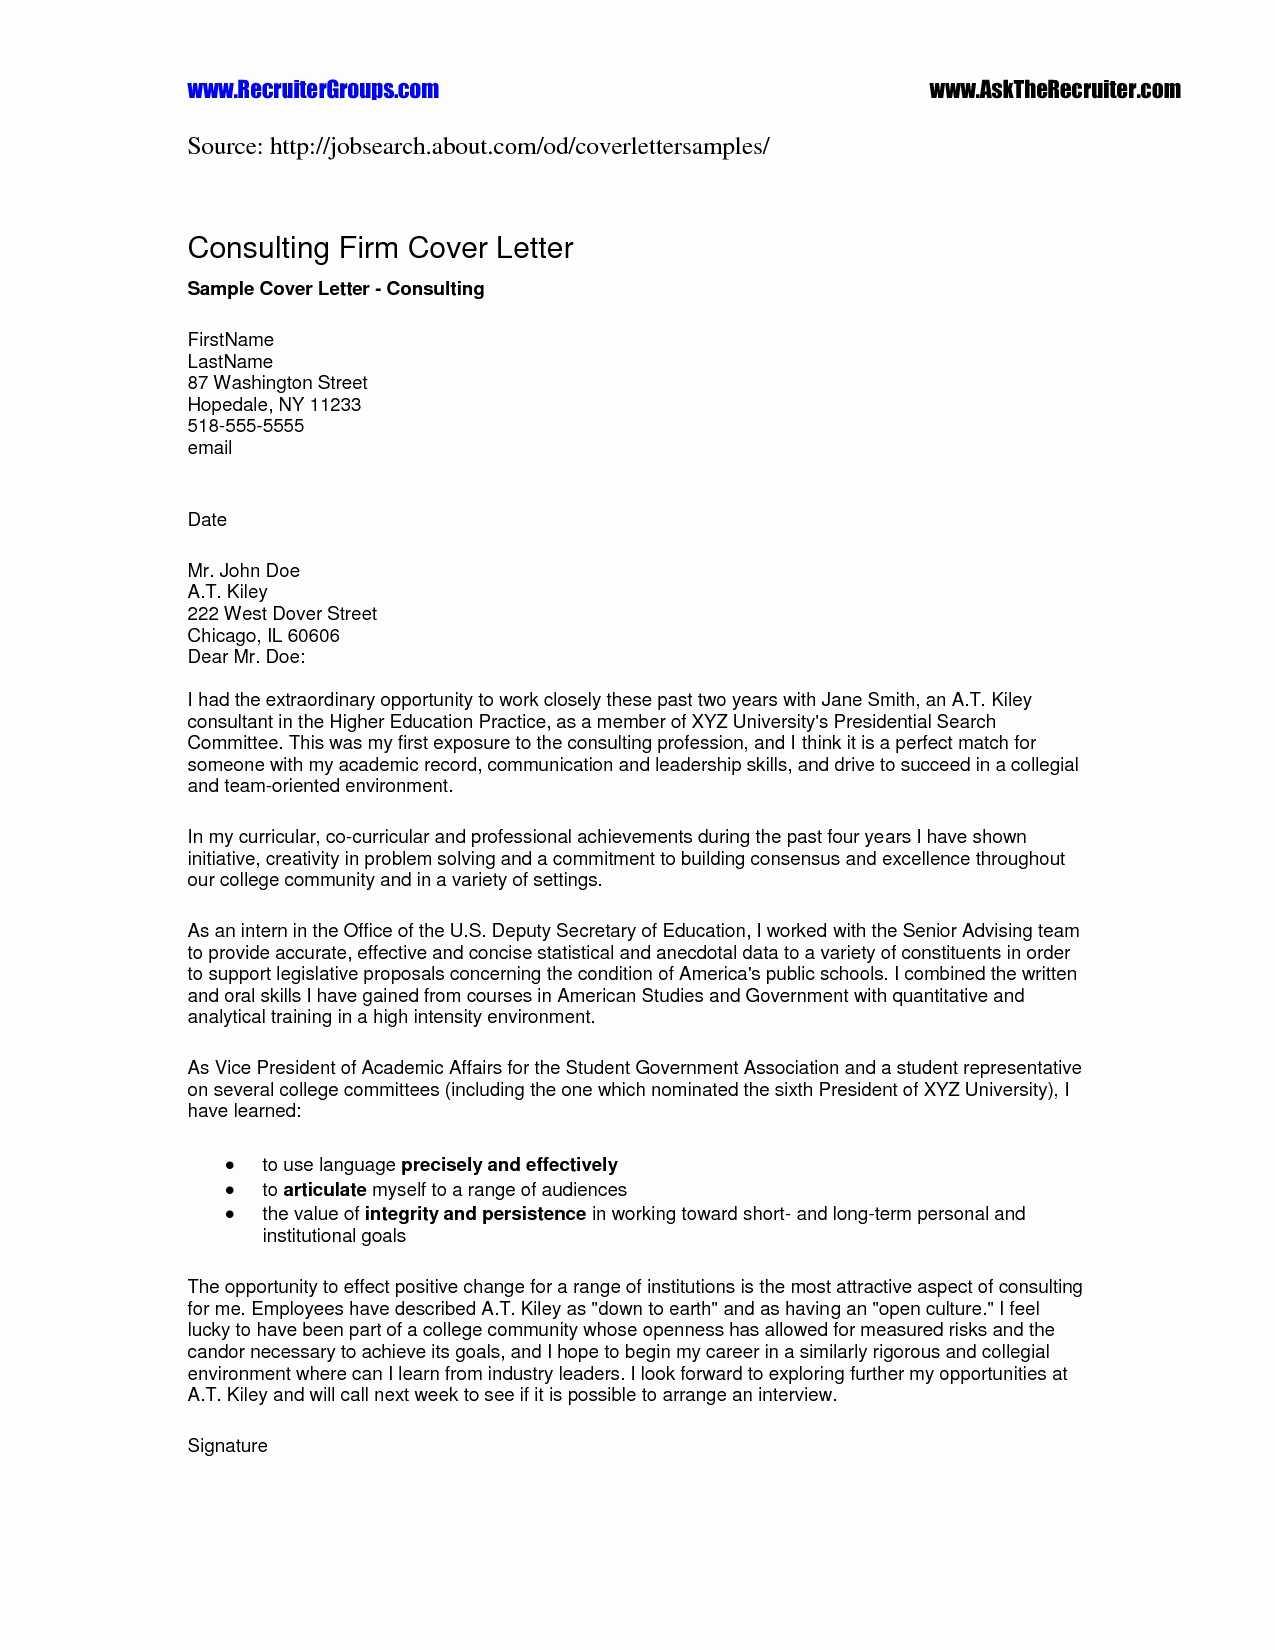 Gift Letter Template for Home Loan - Mortgage Loan Agreement Sample Elegant Mortgage Gift Letter Template